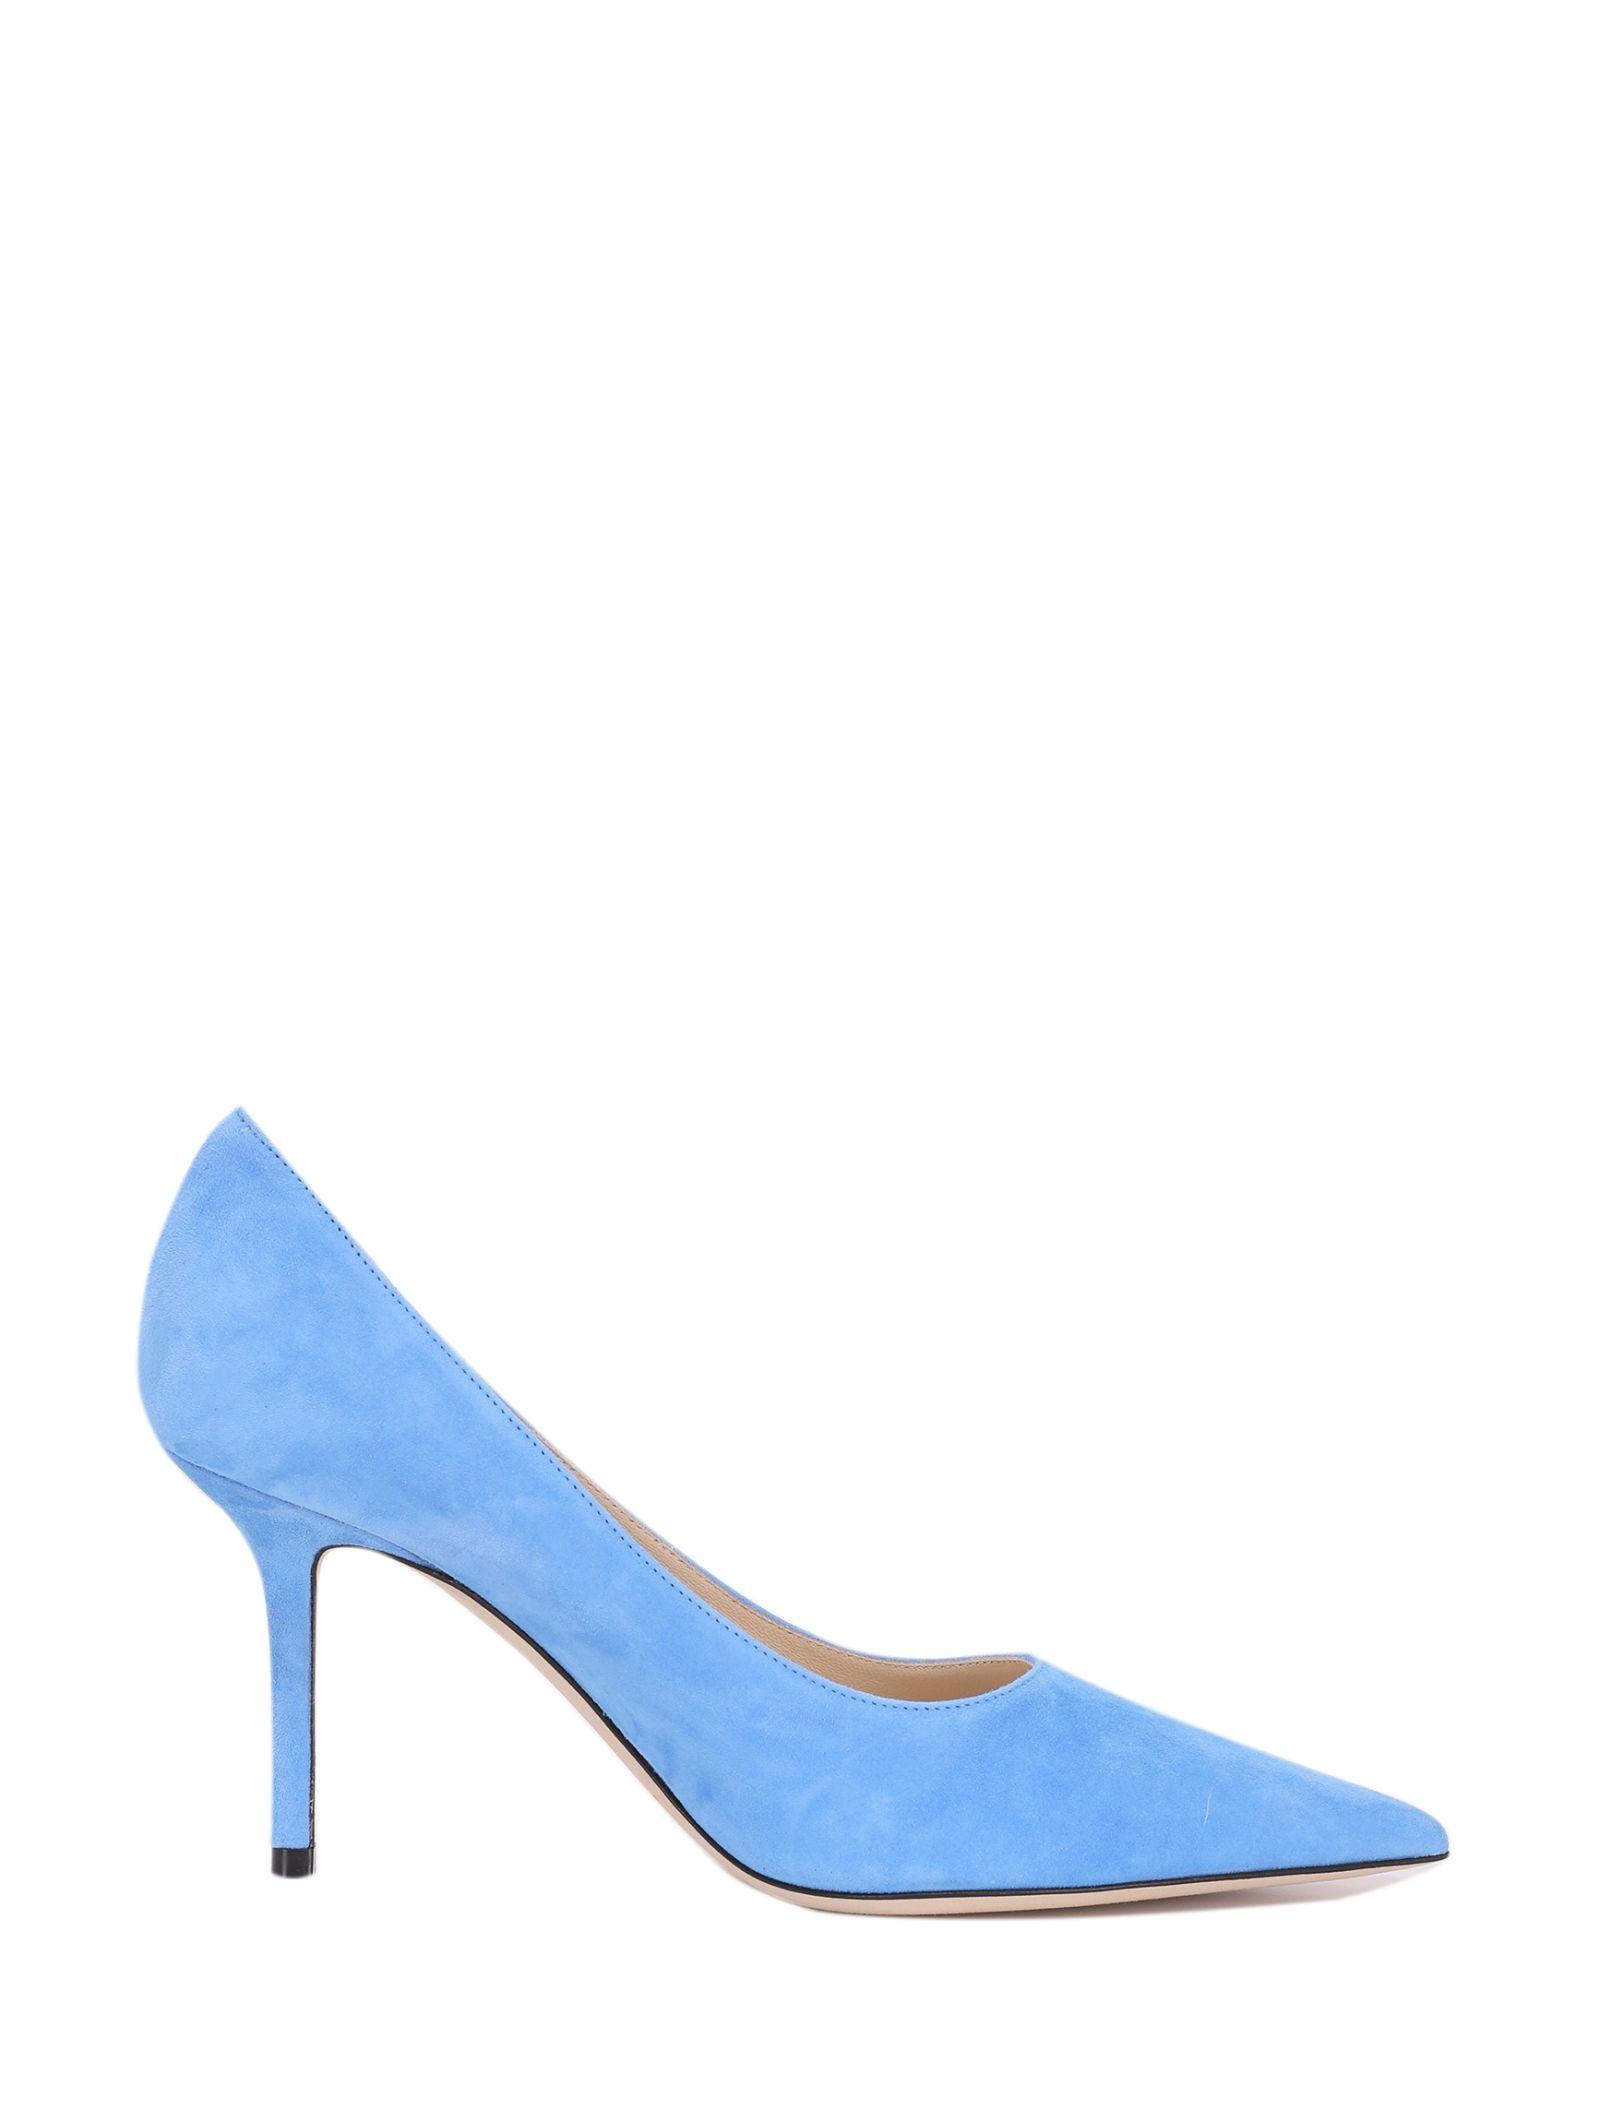 b82e051088 Jimmy Choo Jimmy Choo Light Blue Love 85 Pump - Light blue ...